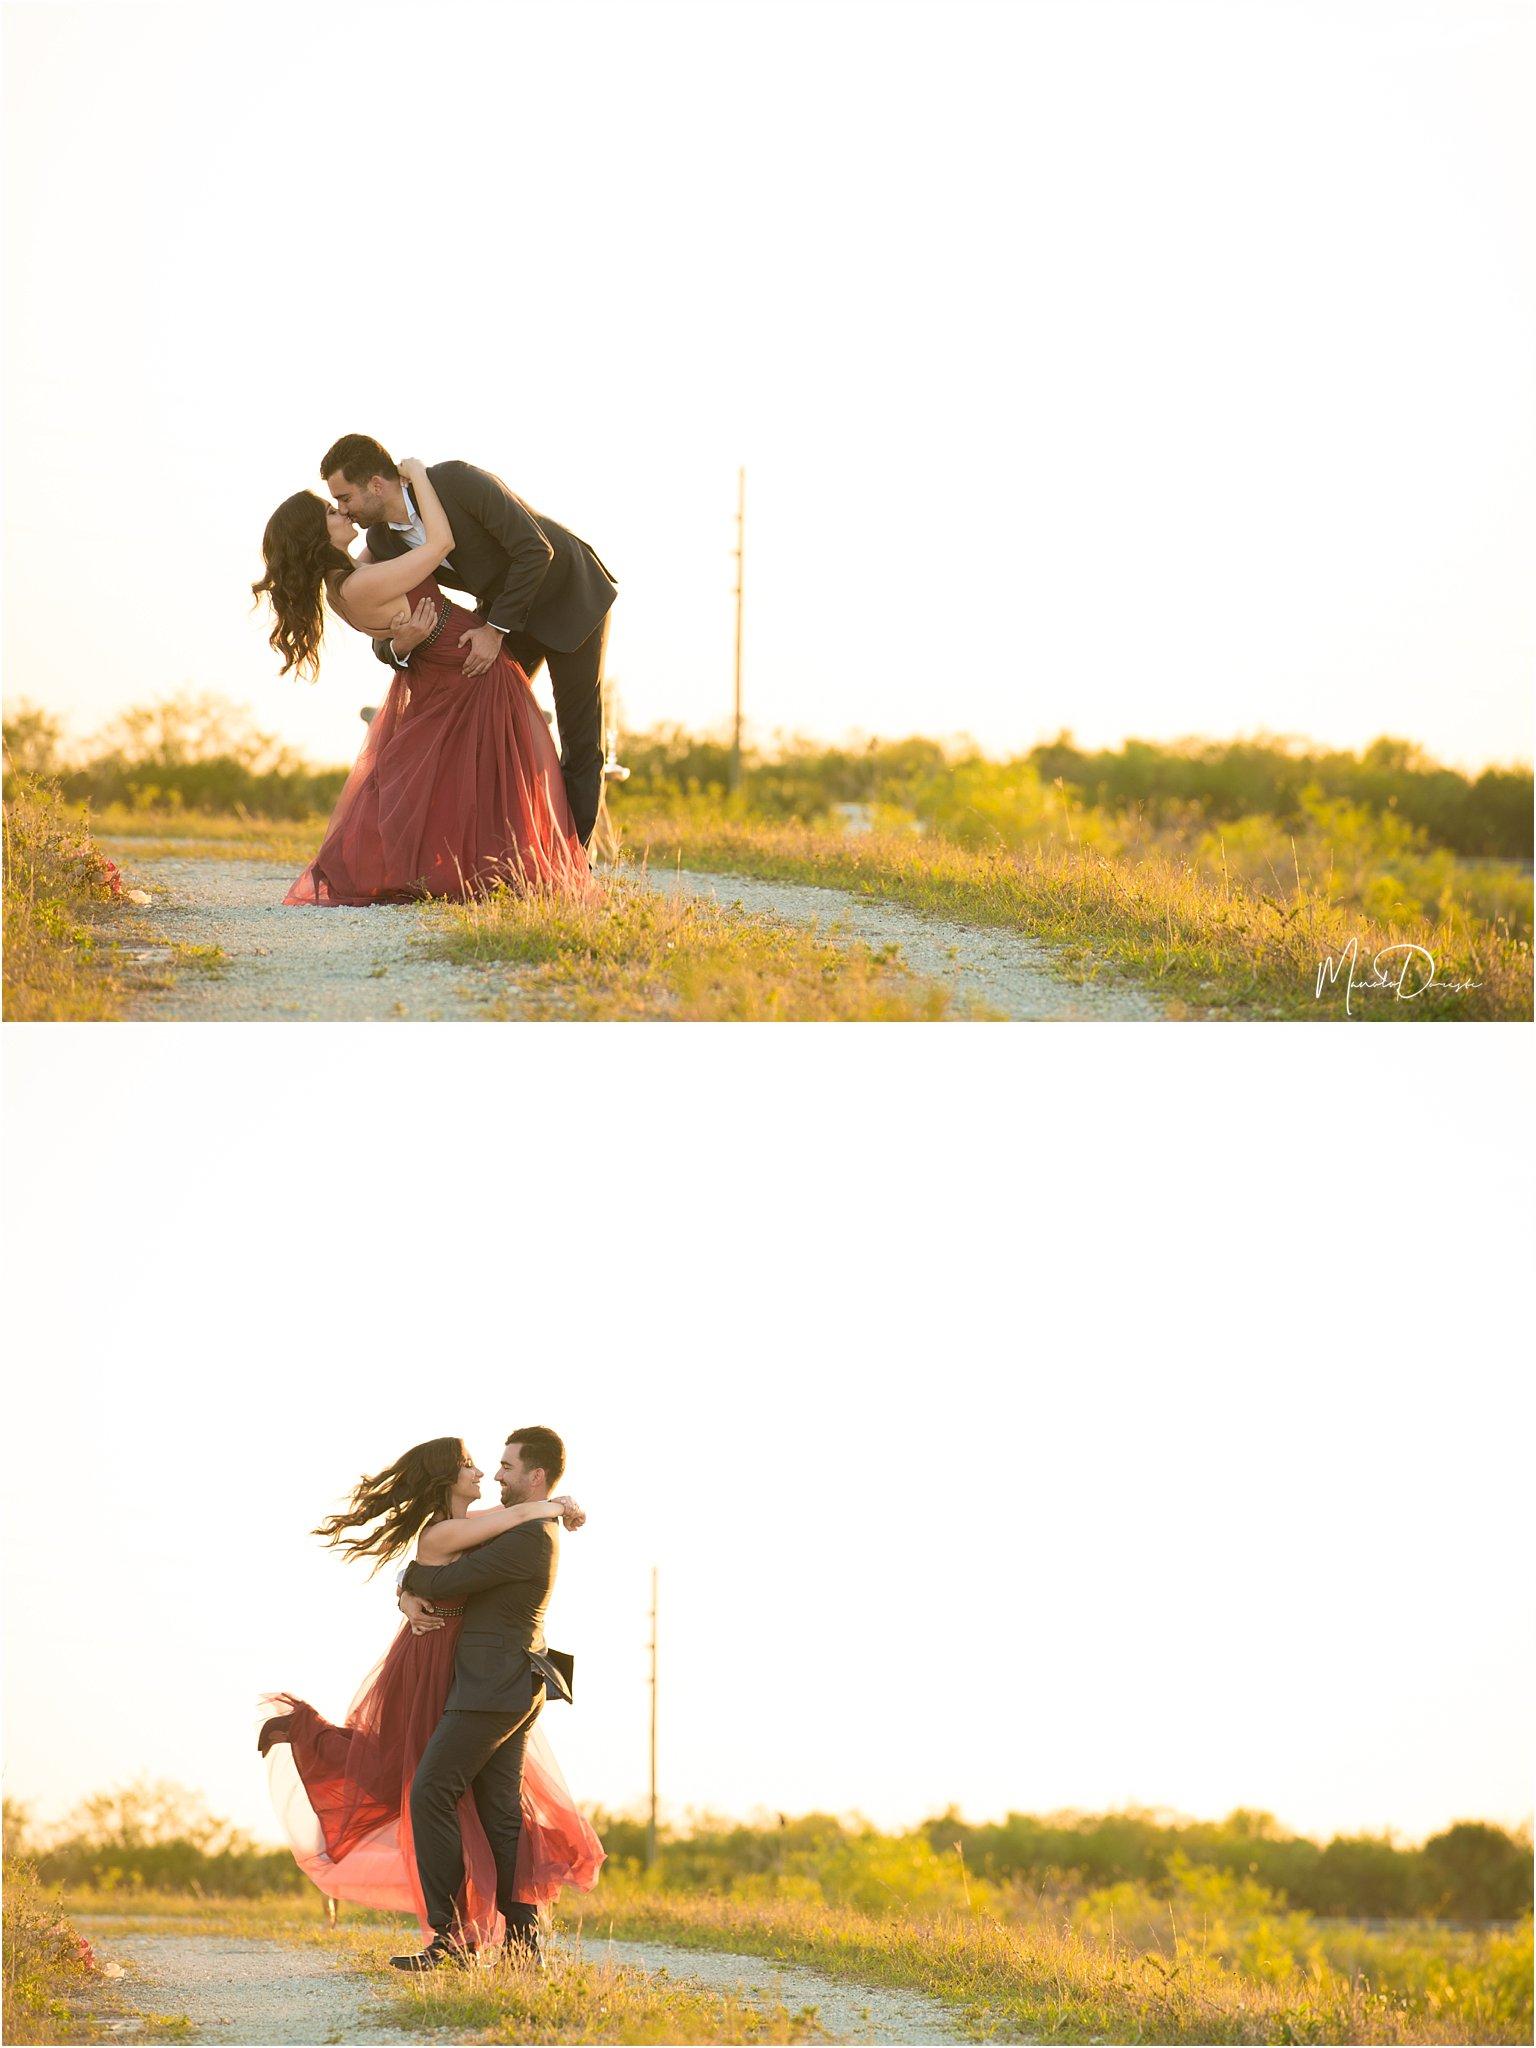 00822_ManoloDoreste_InFocusStudios_Wedding_Family_Photography_Miami_MiamiPhotographer.jpg